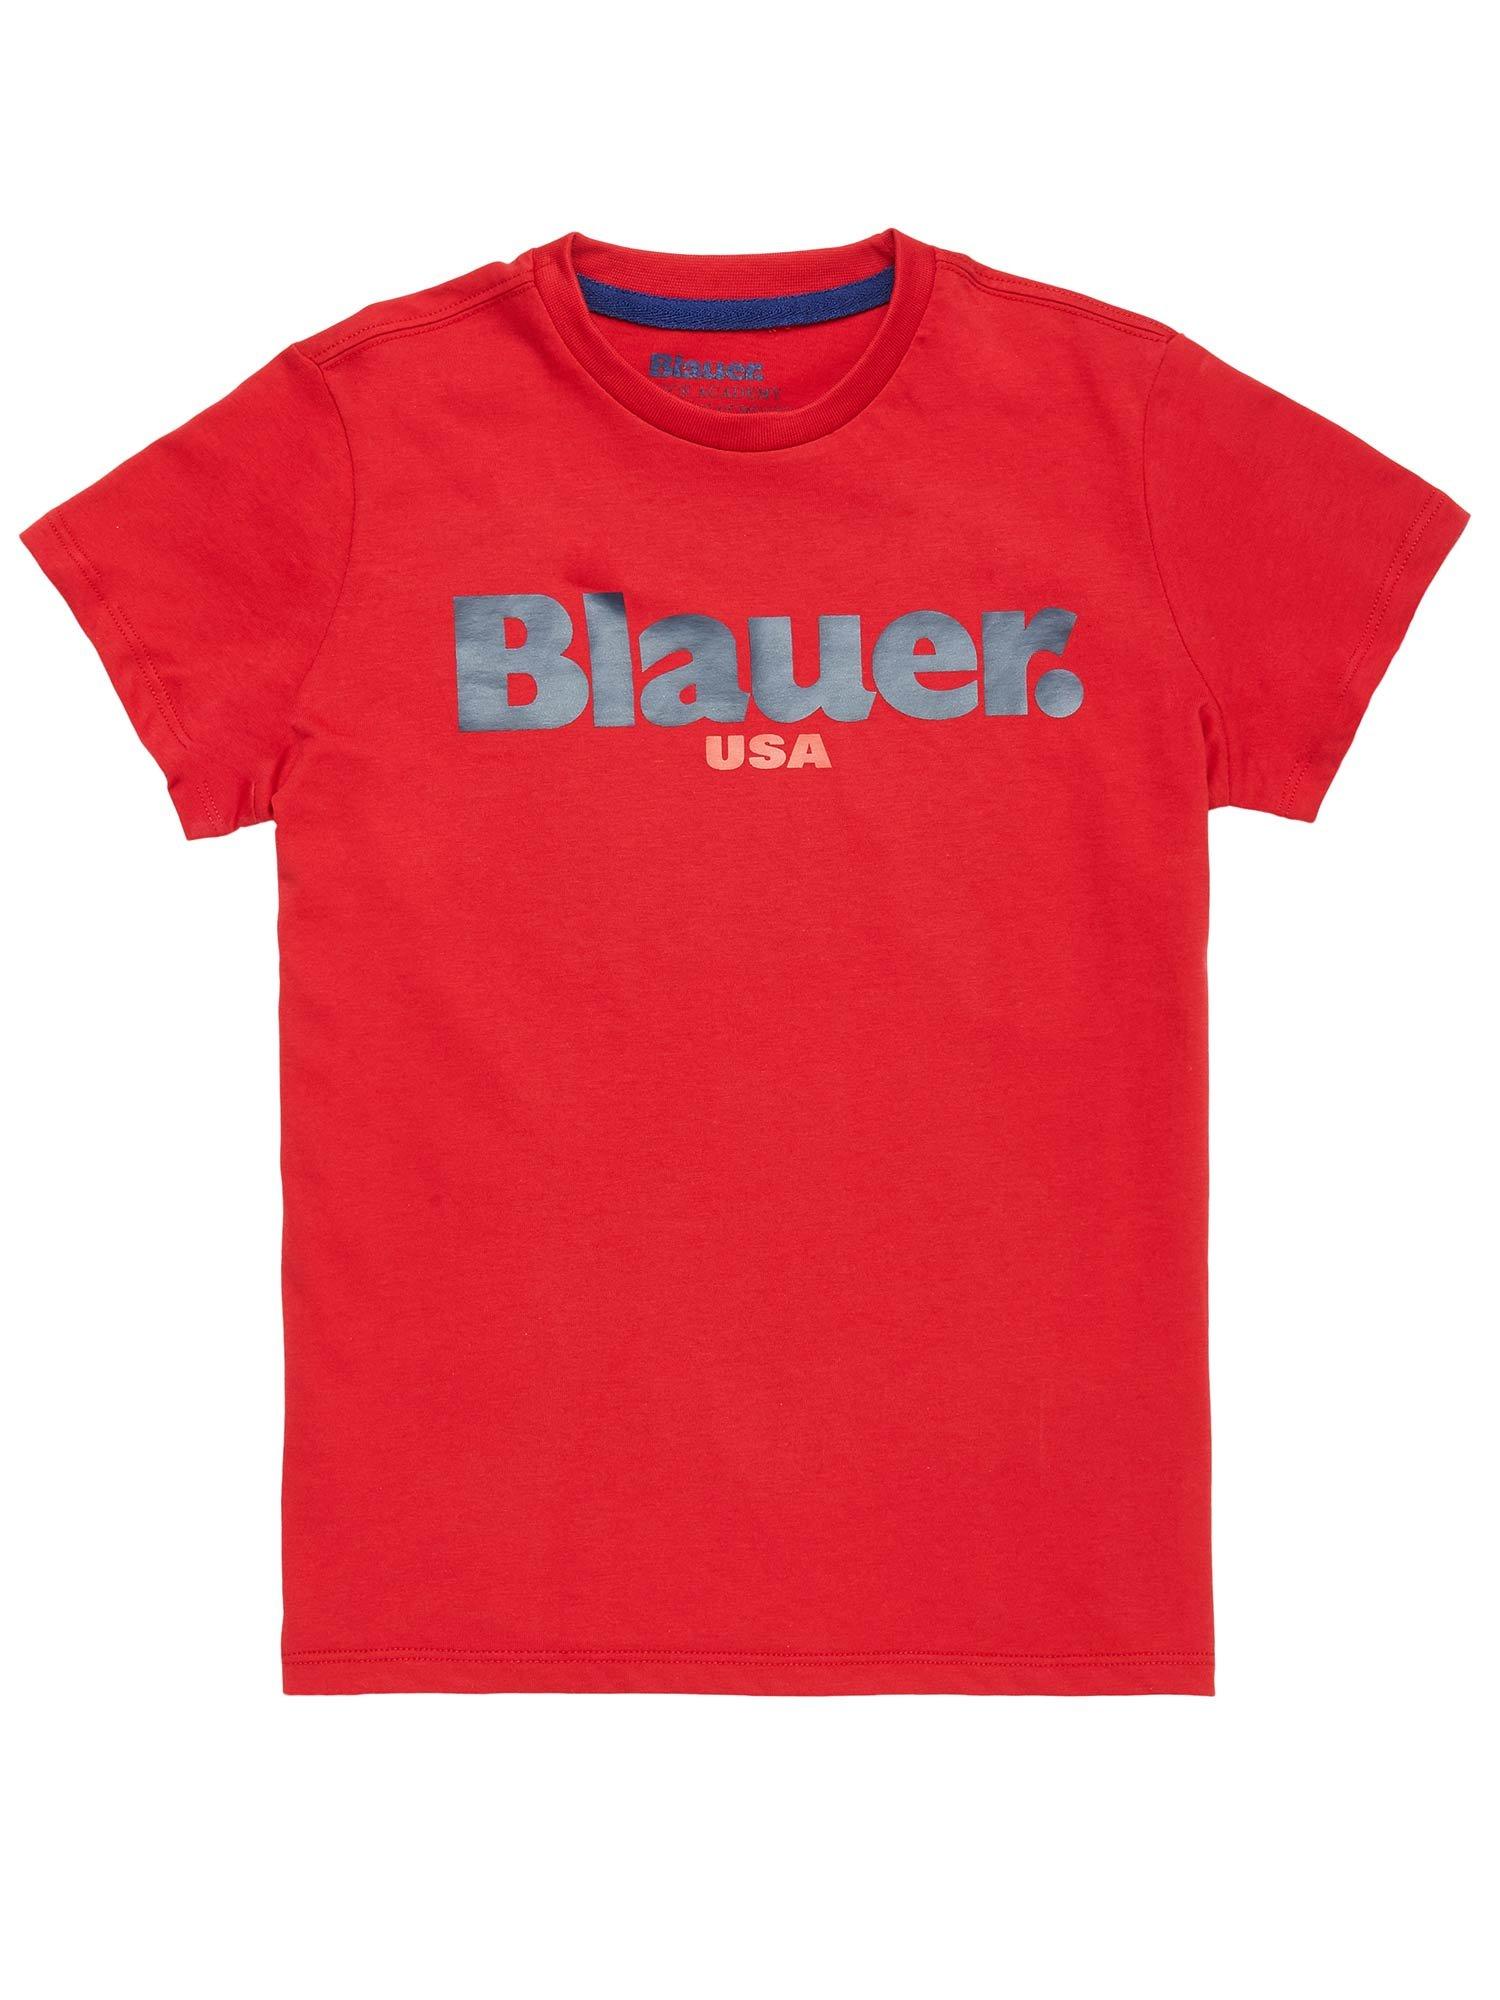 Blauer - T-SHIRT BAMBINO BLAUER USA - Rosso Sangue - Blauer